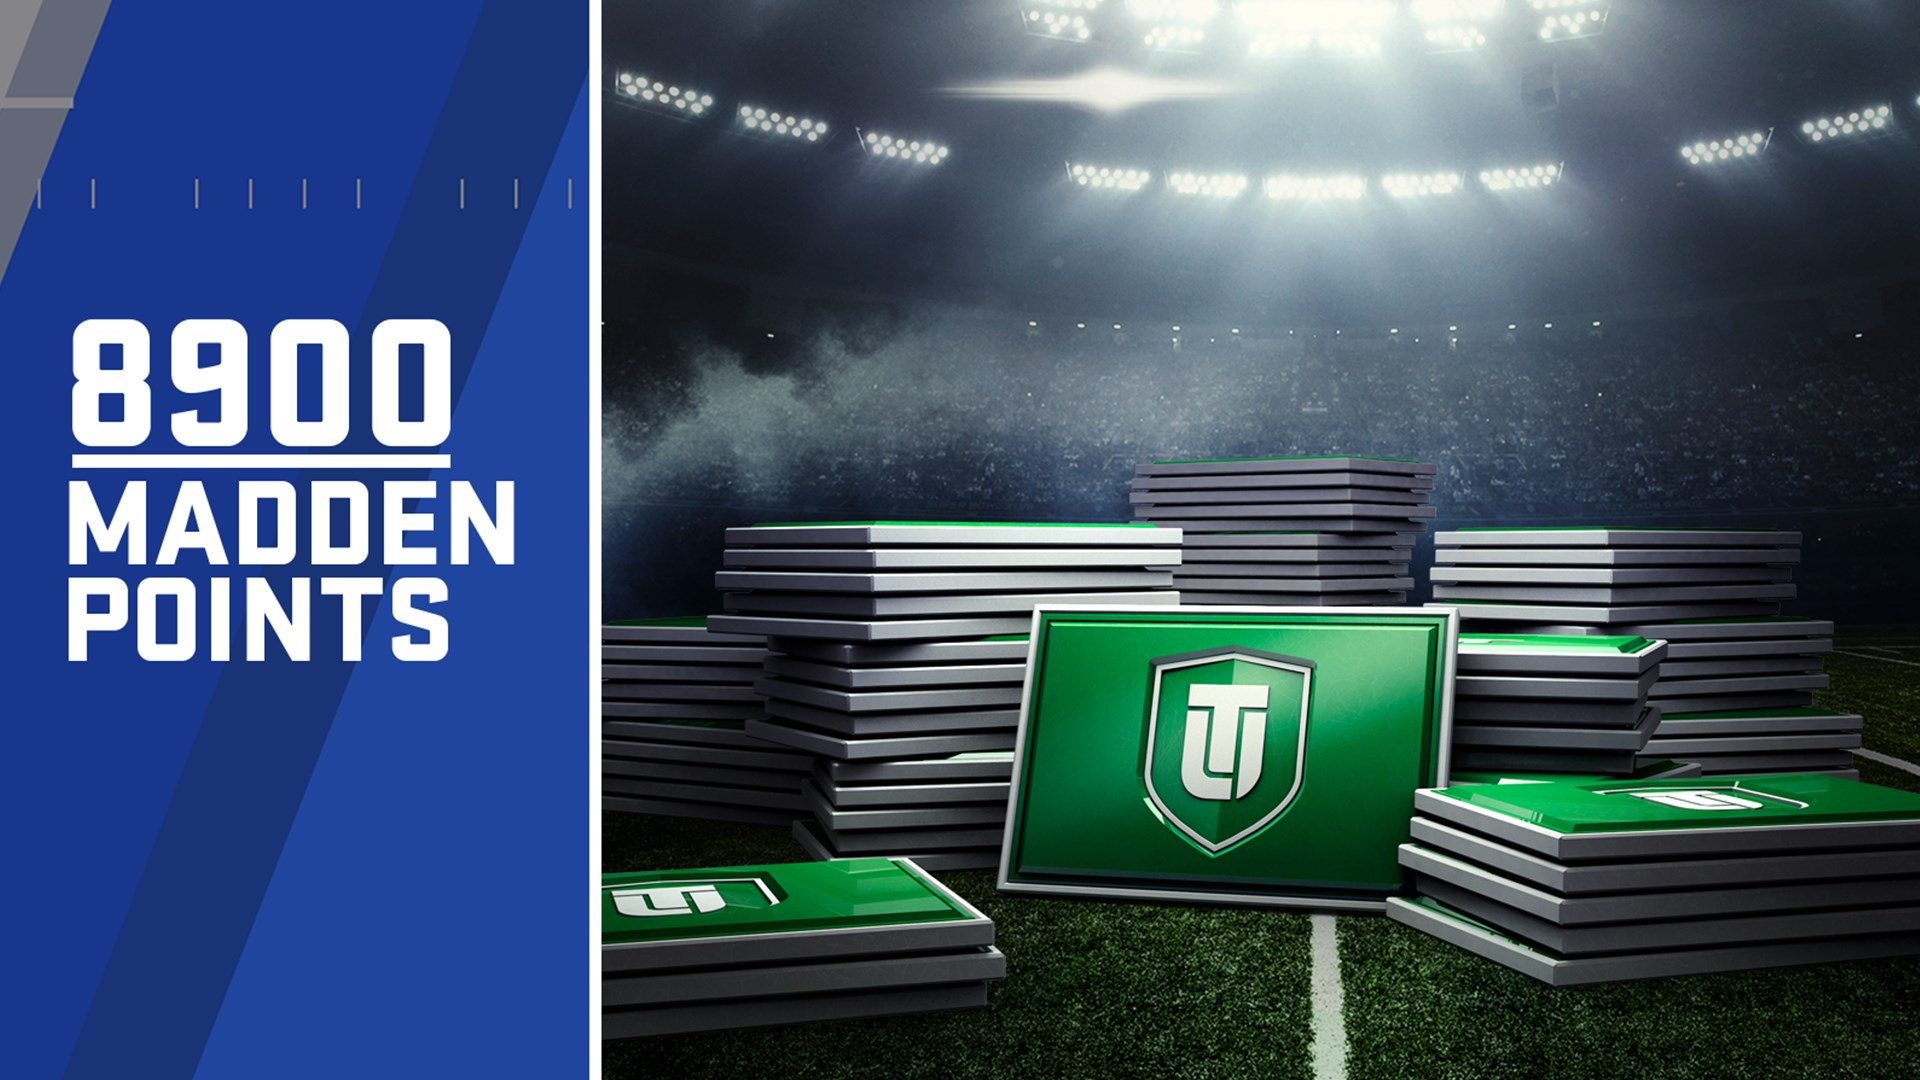 8900 Madden NFL 18 Ultimate Team Points